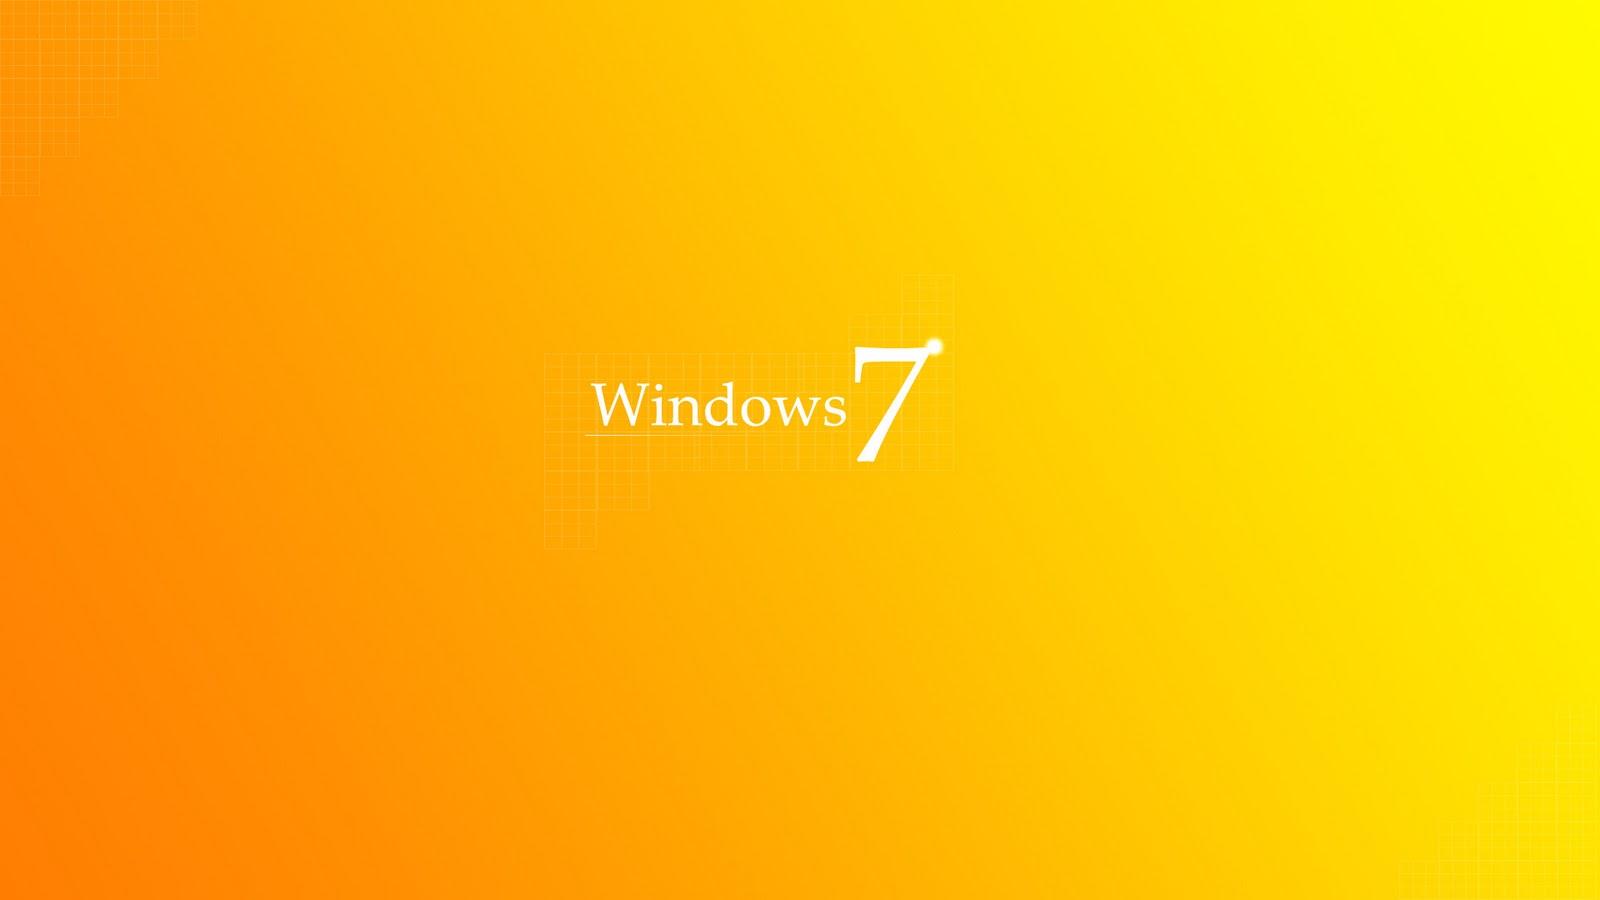 windows 7 Computer Wallpapers Desktop Backgrounds 1600x900 ID 1600x900